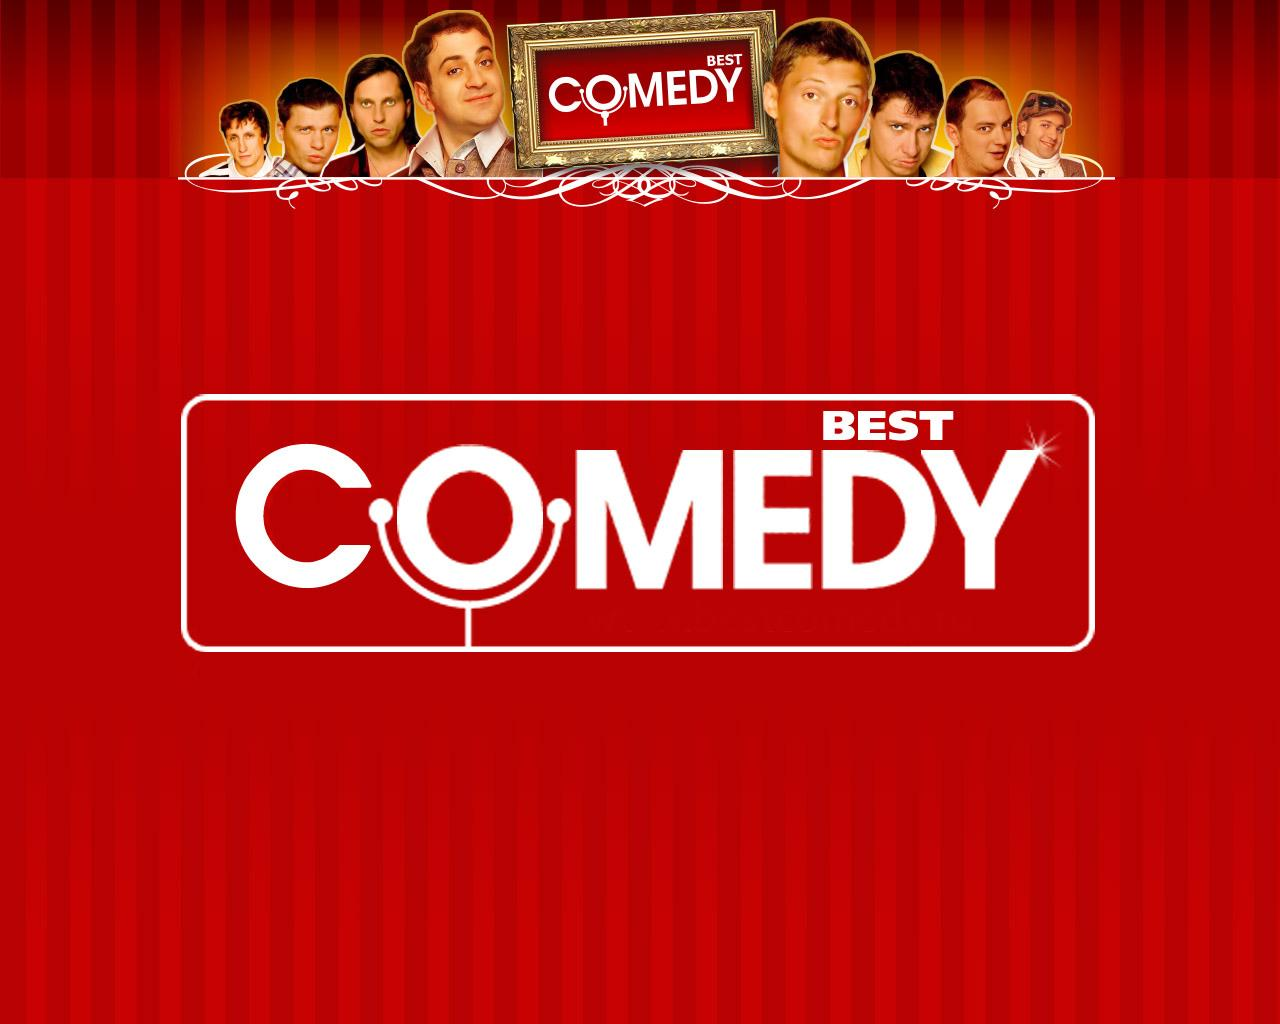 Comedy или STANDUP стиль